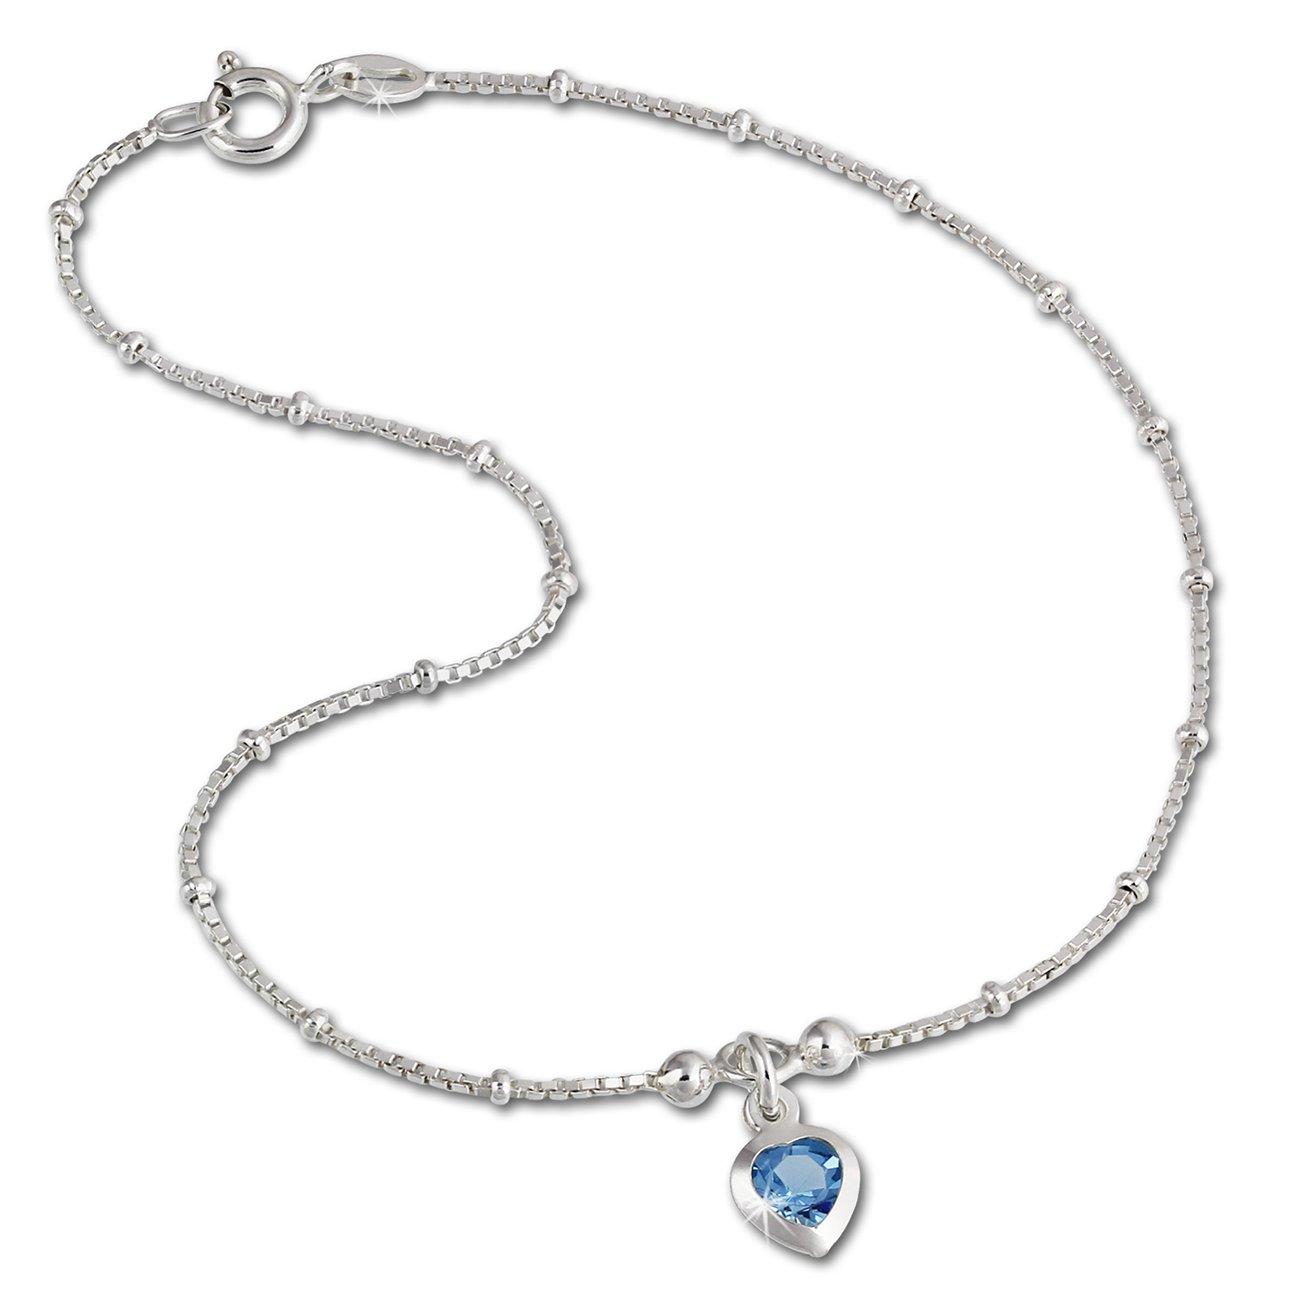 Bangle009 Big Promotion 1Set Women Bohemian Beaded Elephant Sun Chain Anklet Fashion 3 Layers Jewelry Silver